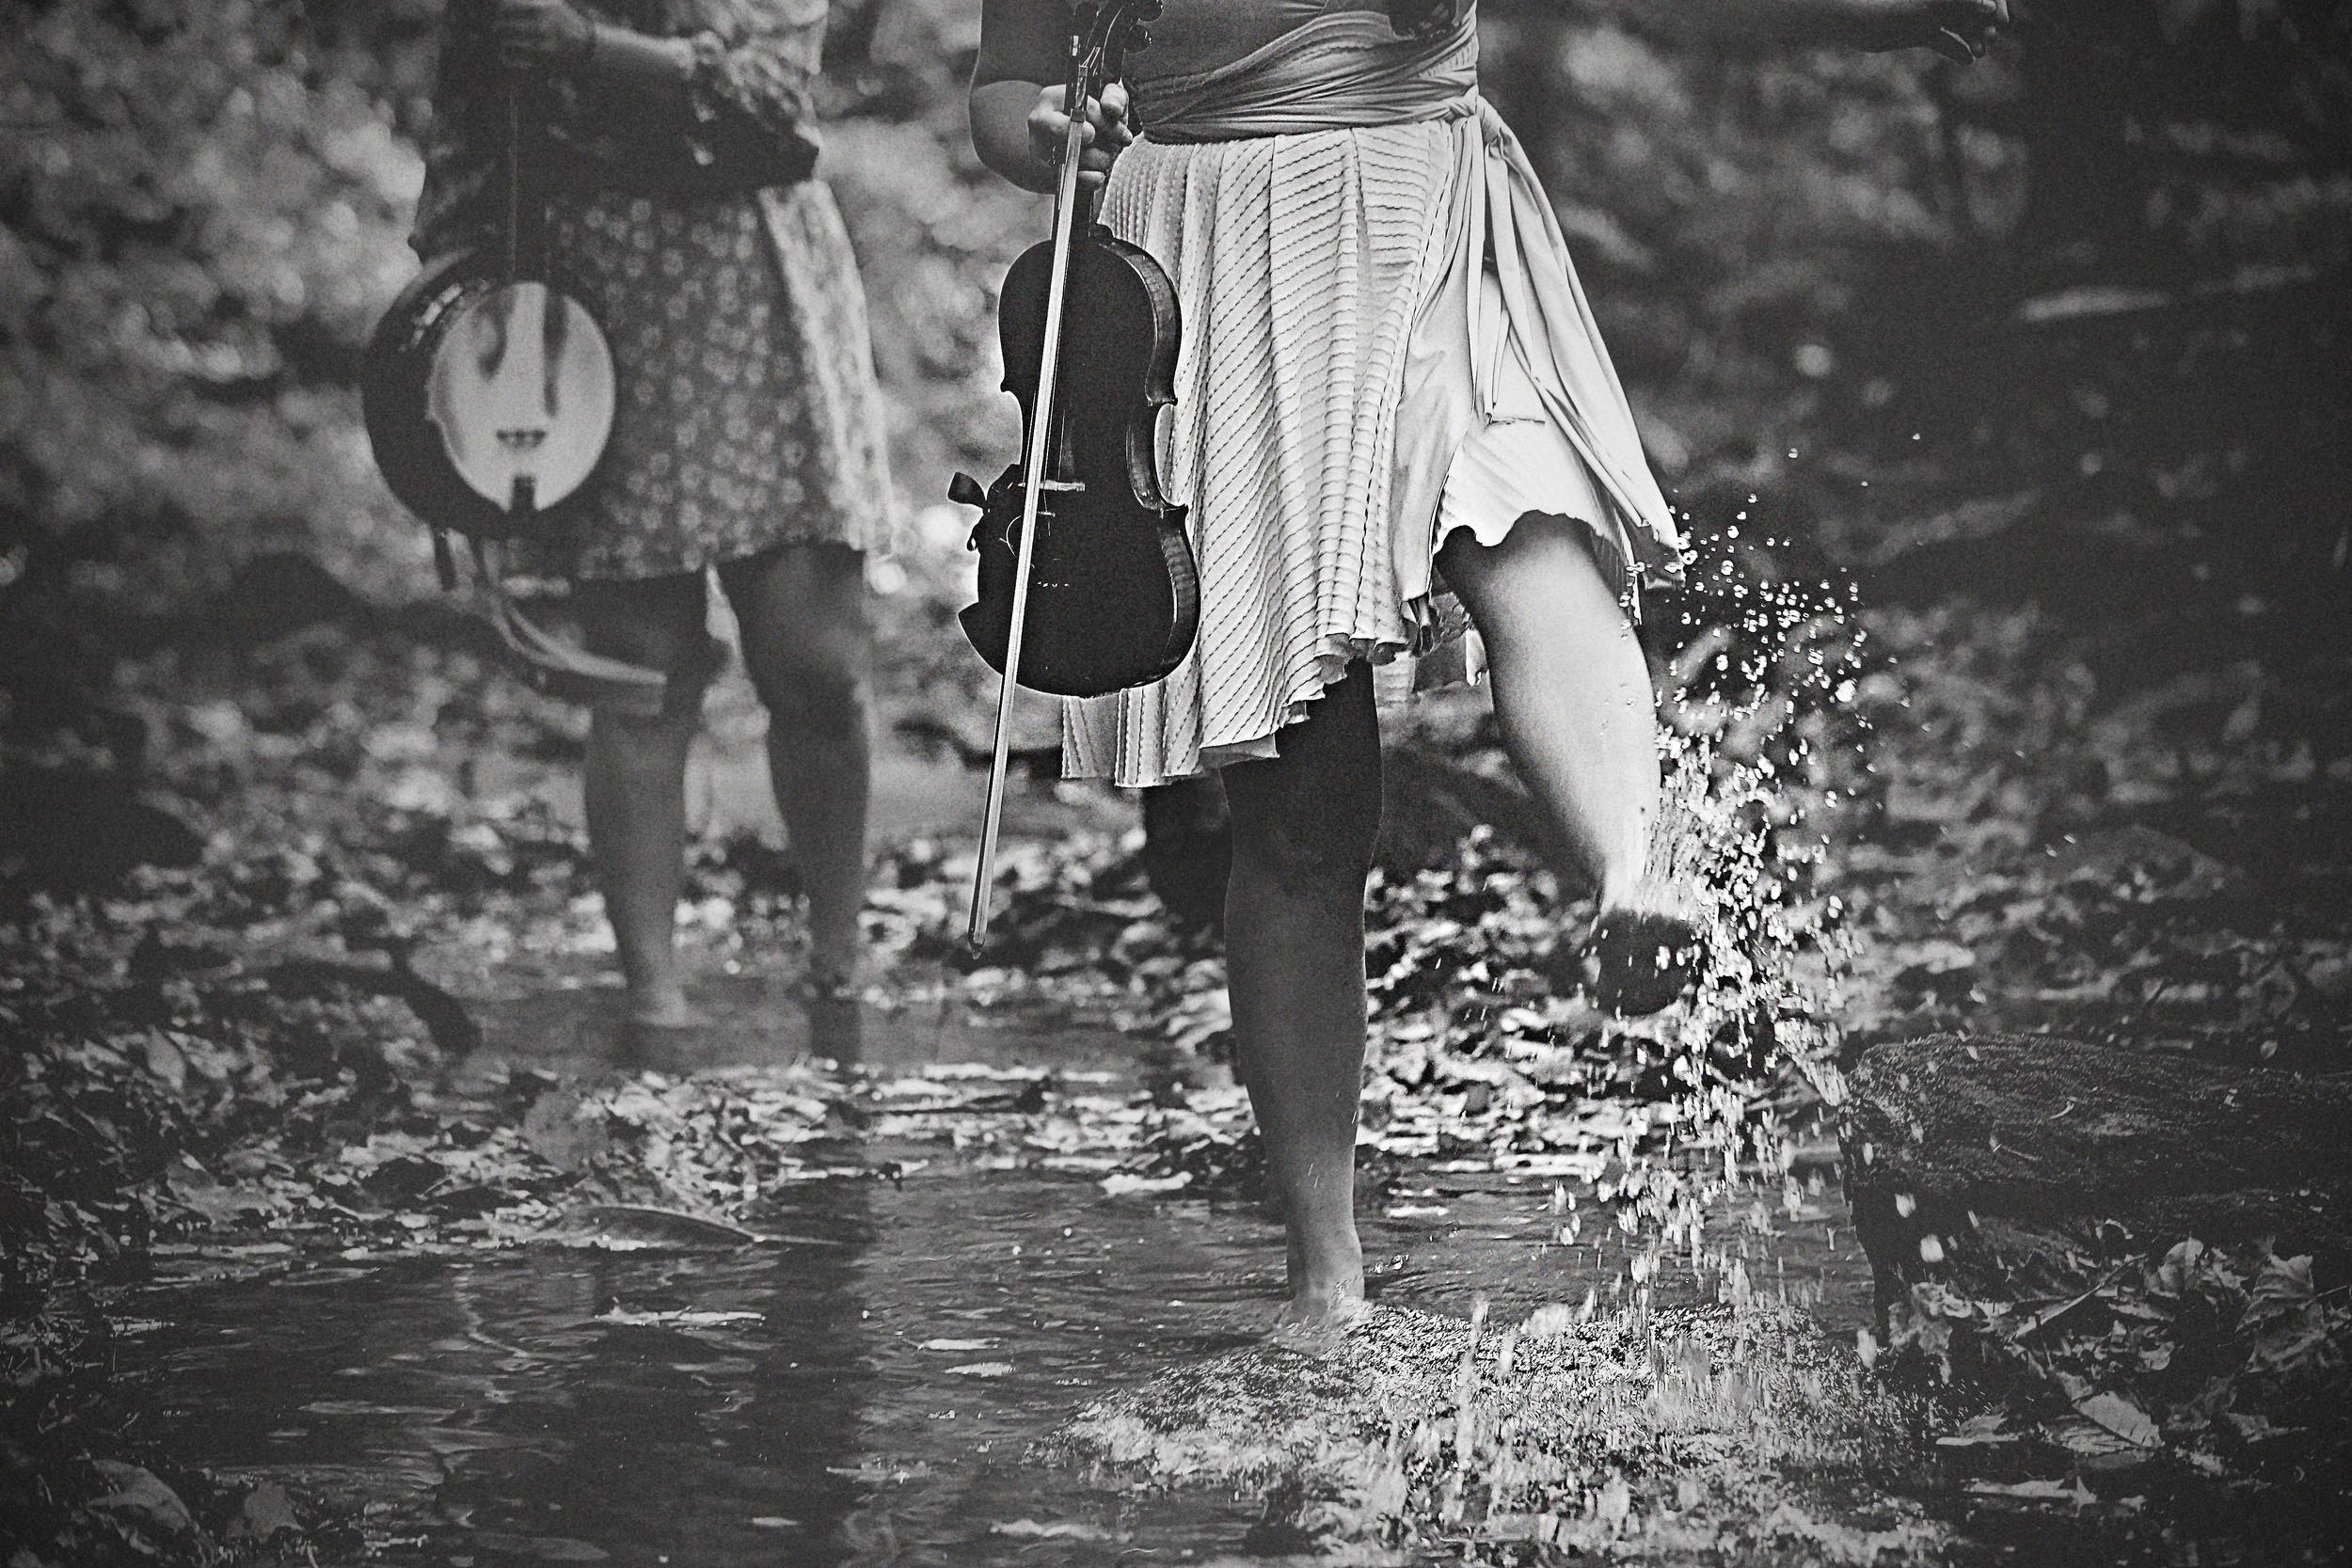 Little Sinkin' Creek (Zachariah, Kentucky)